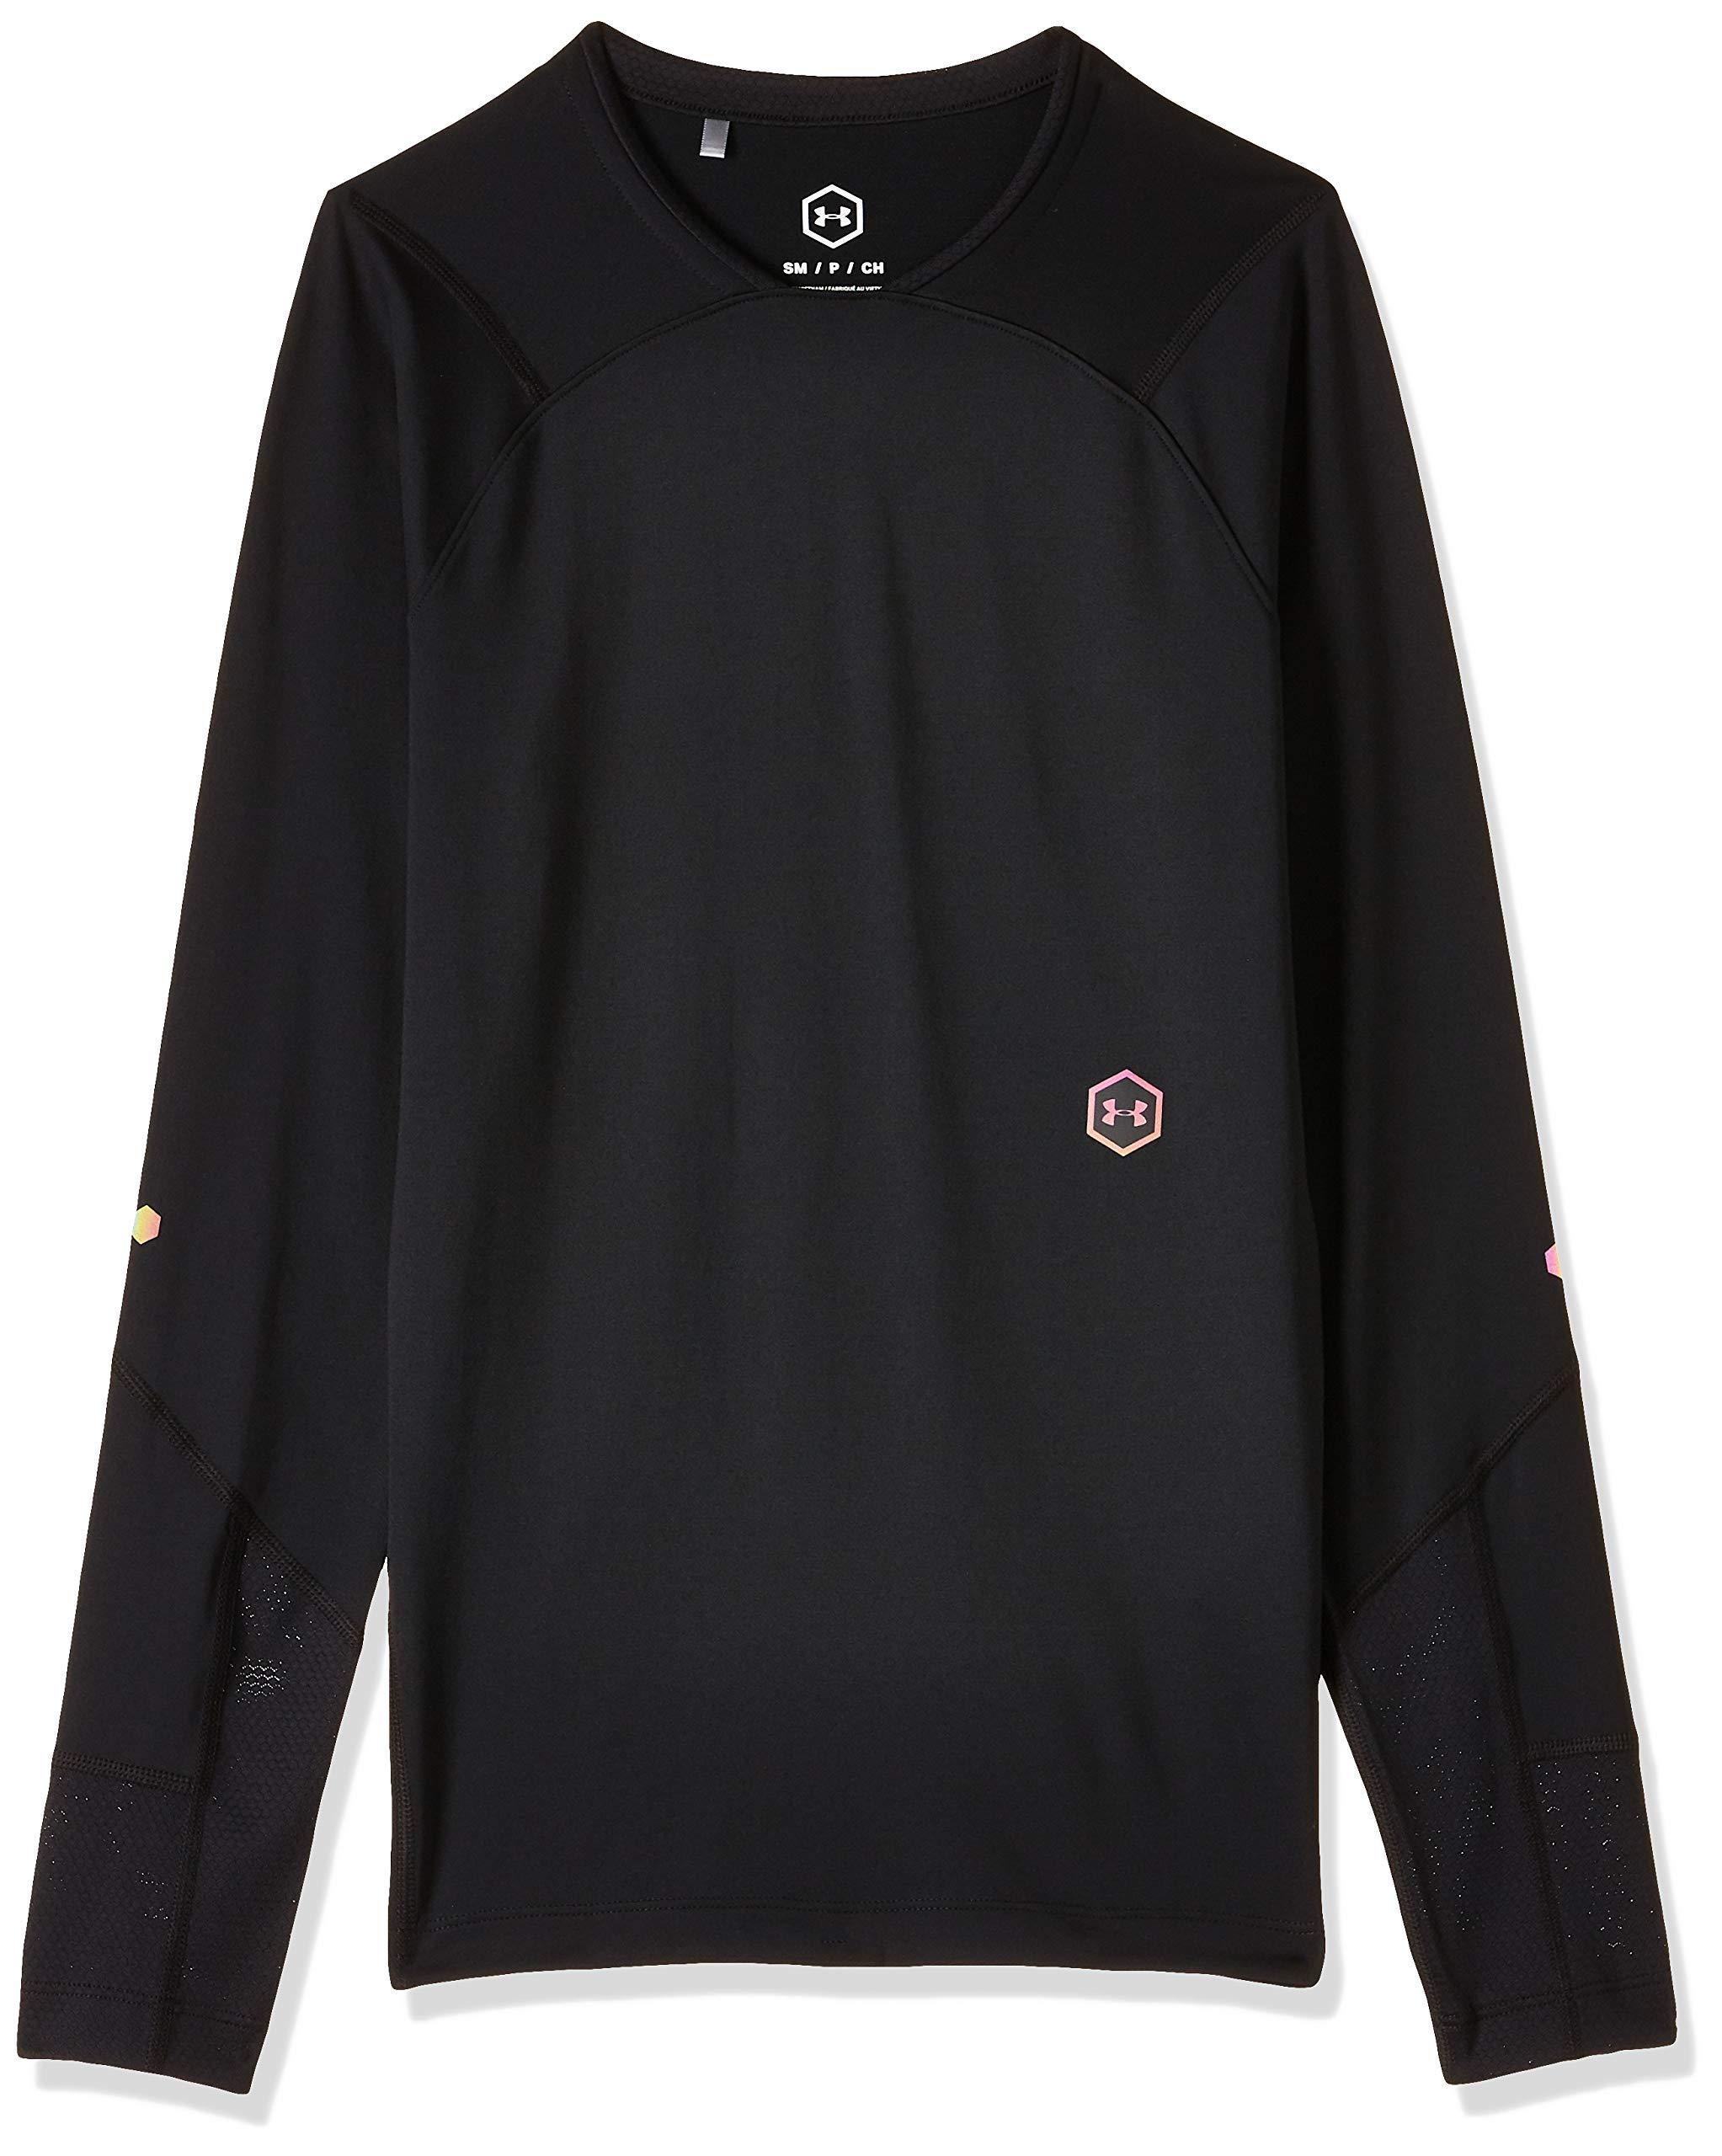 Under Armour Herren UA Rush Kompressionsshirt, leichtes Langarmshirt mit Rush-Te